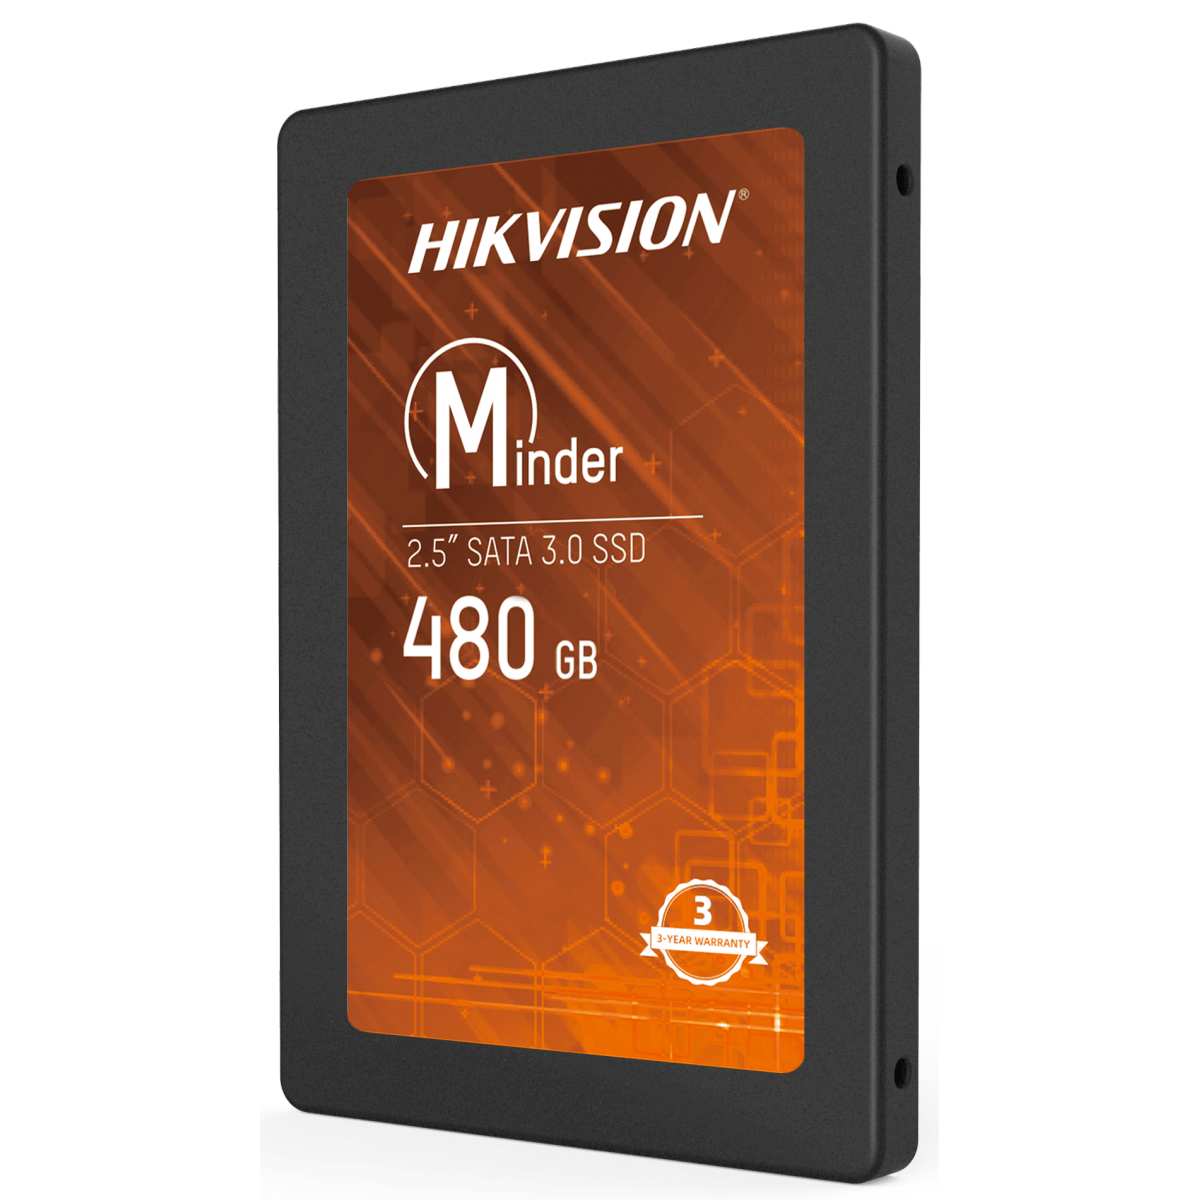 SSD Hikvision Minder, 480GB, Sata III, Leitura 550MBs e Gravação 470MBs, HS-SSD-Minder(S)/480G